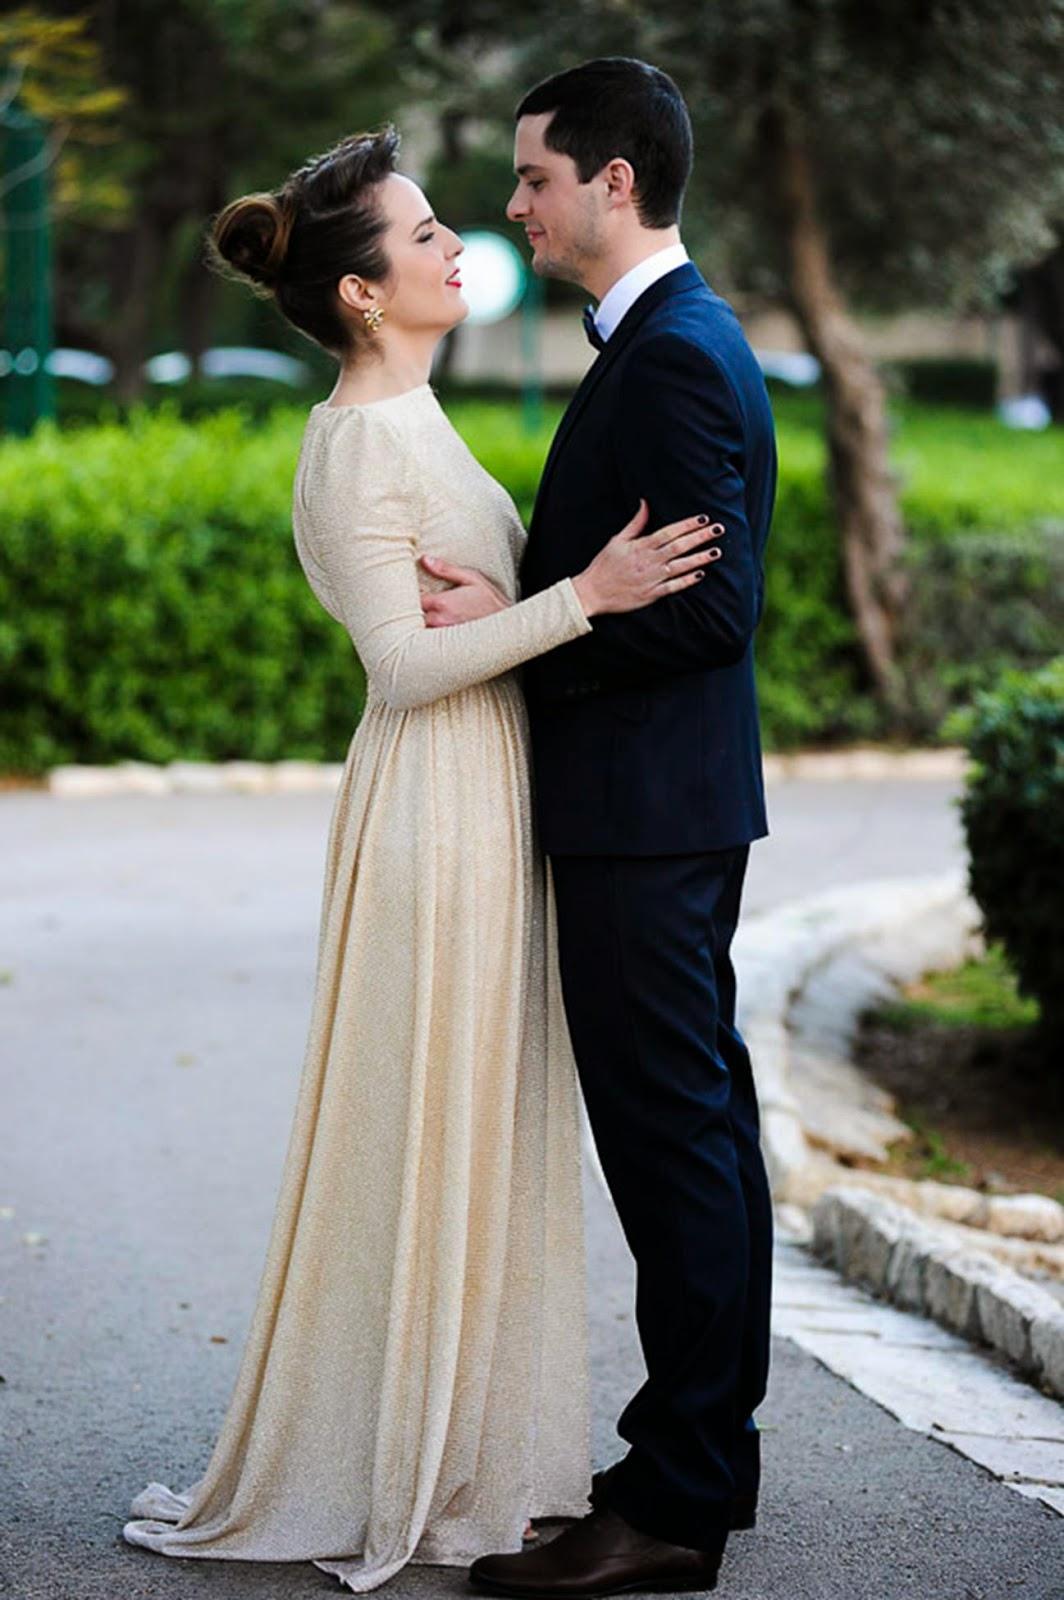 Espectaculares vestidos de novias | Colección Chana Marelus